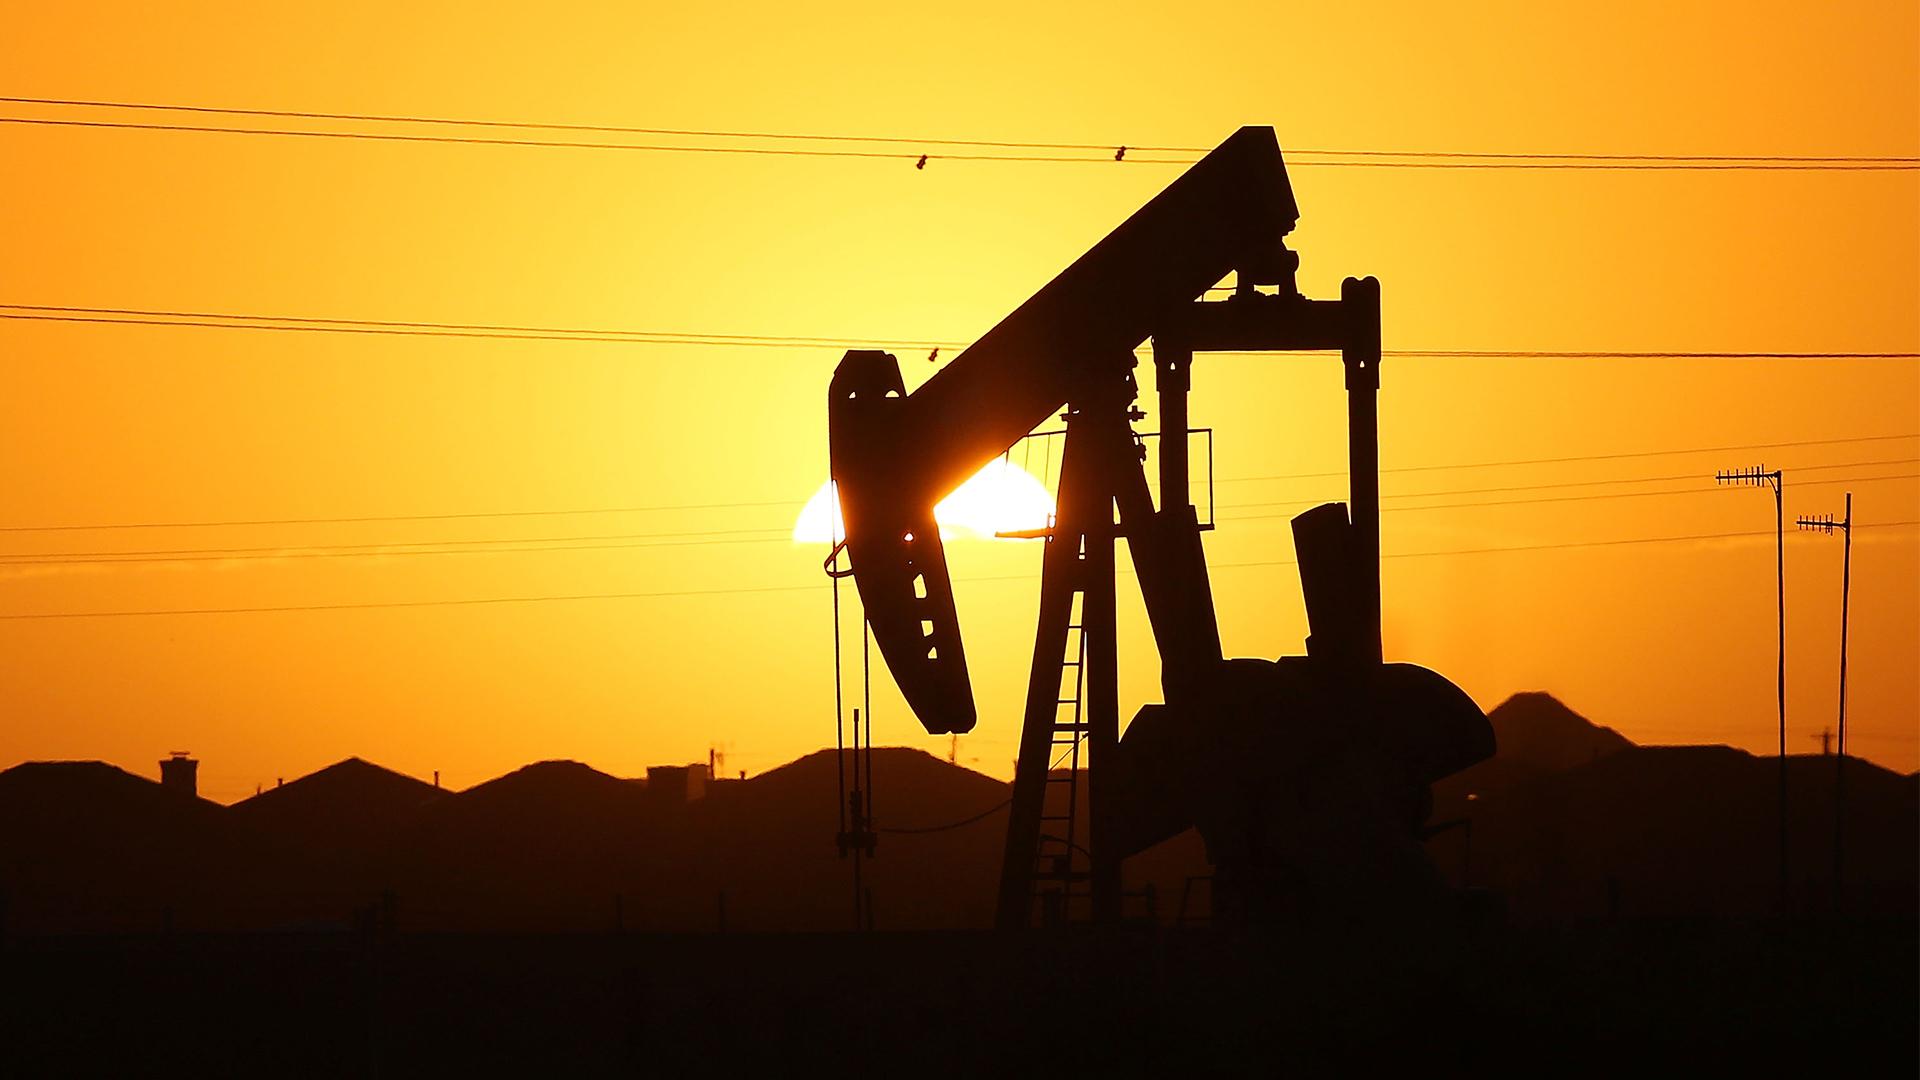 Texas Oil, Oil Derrick, Pumpjack (Getty Images) - 1920